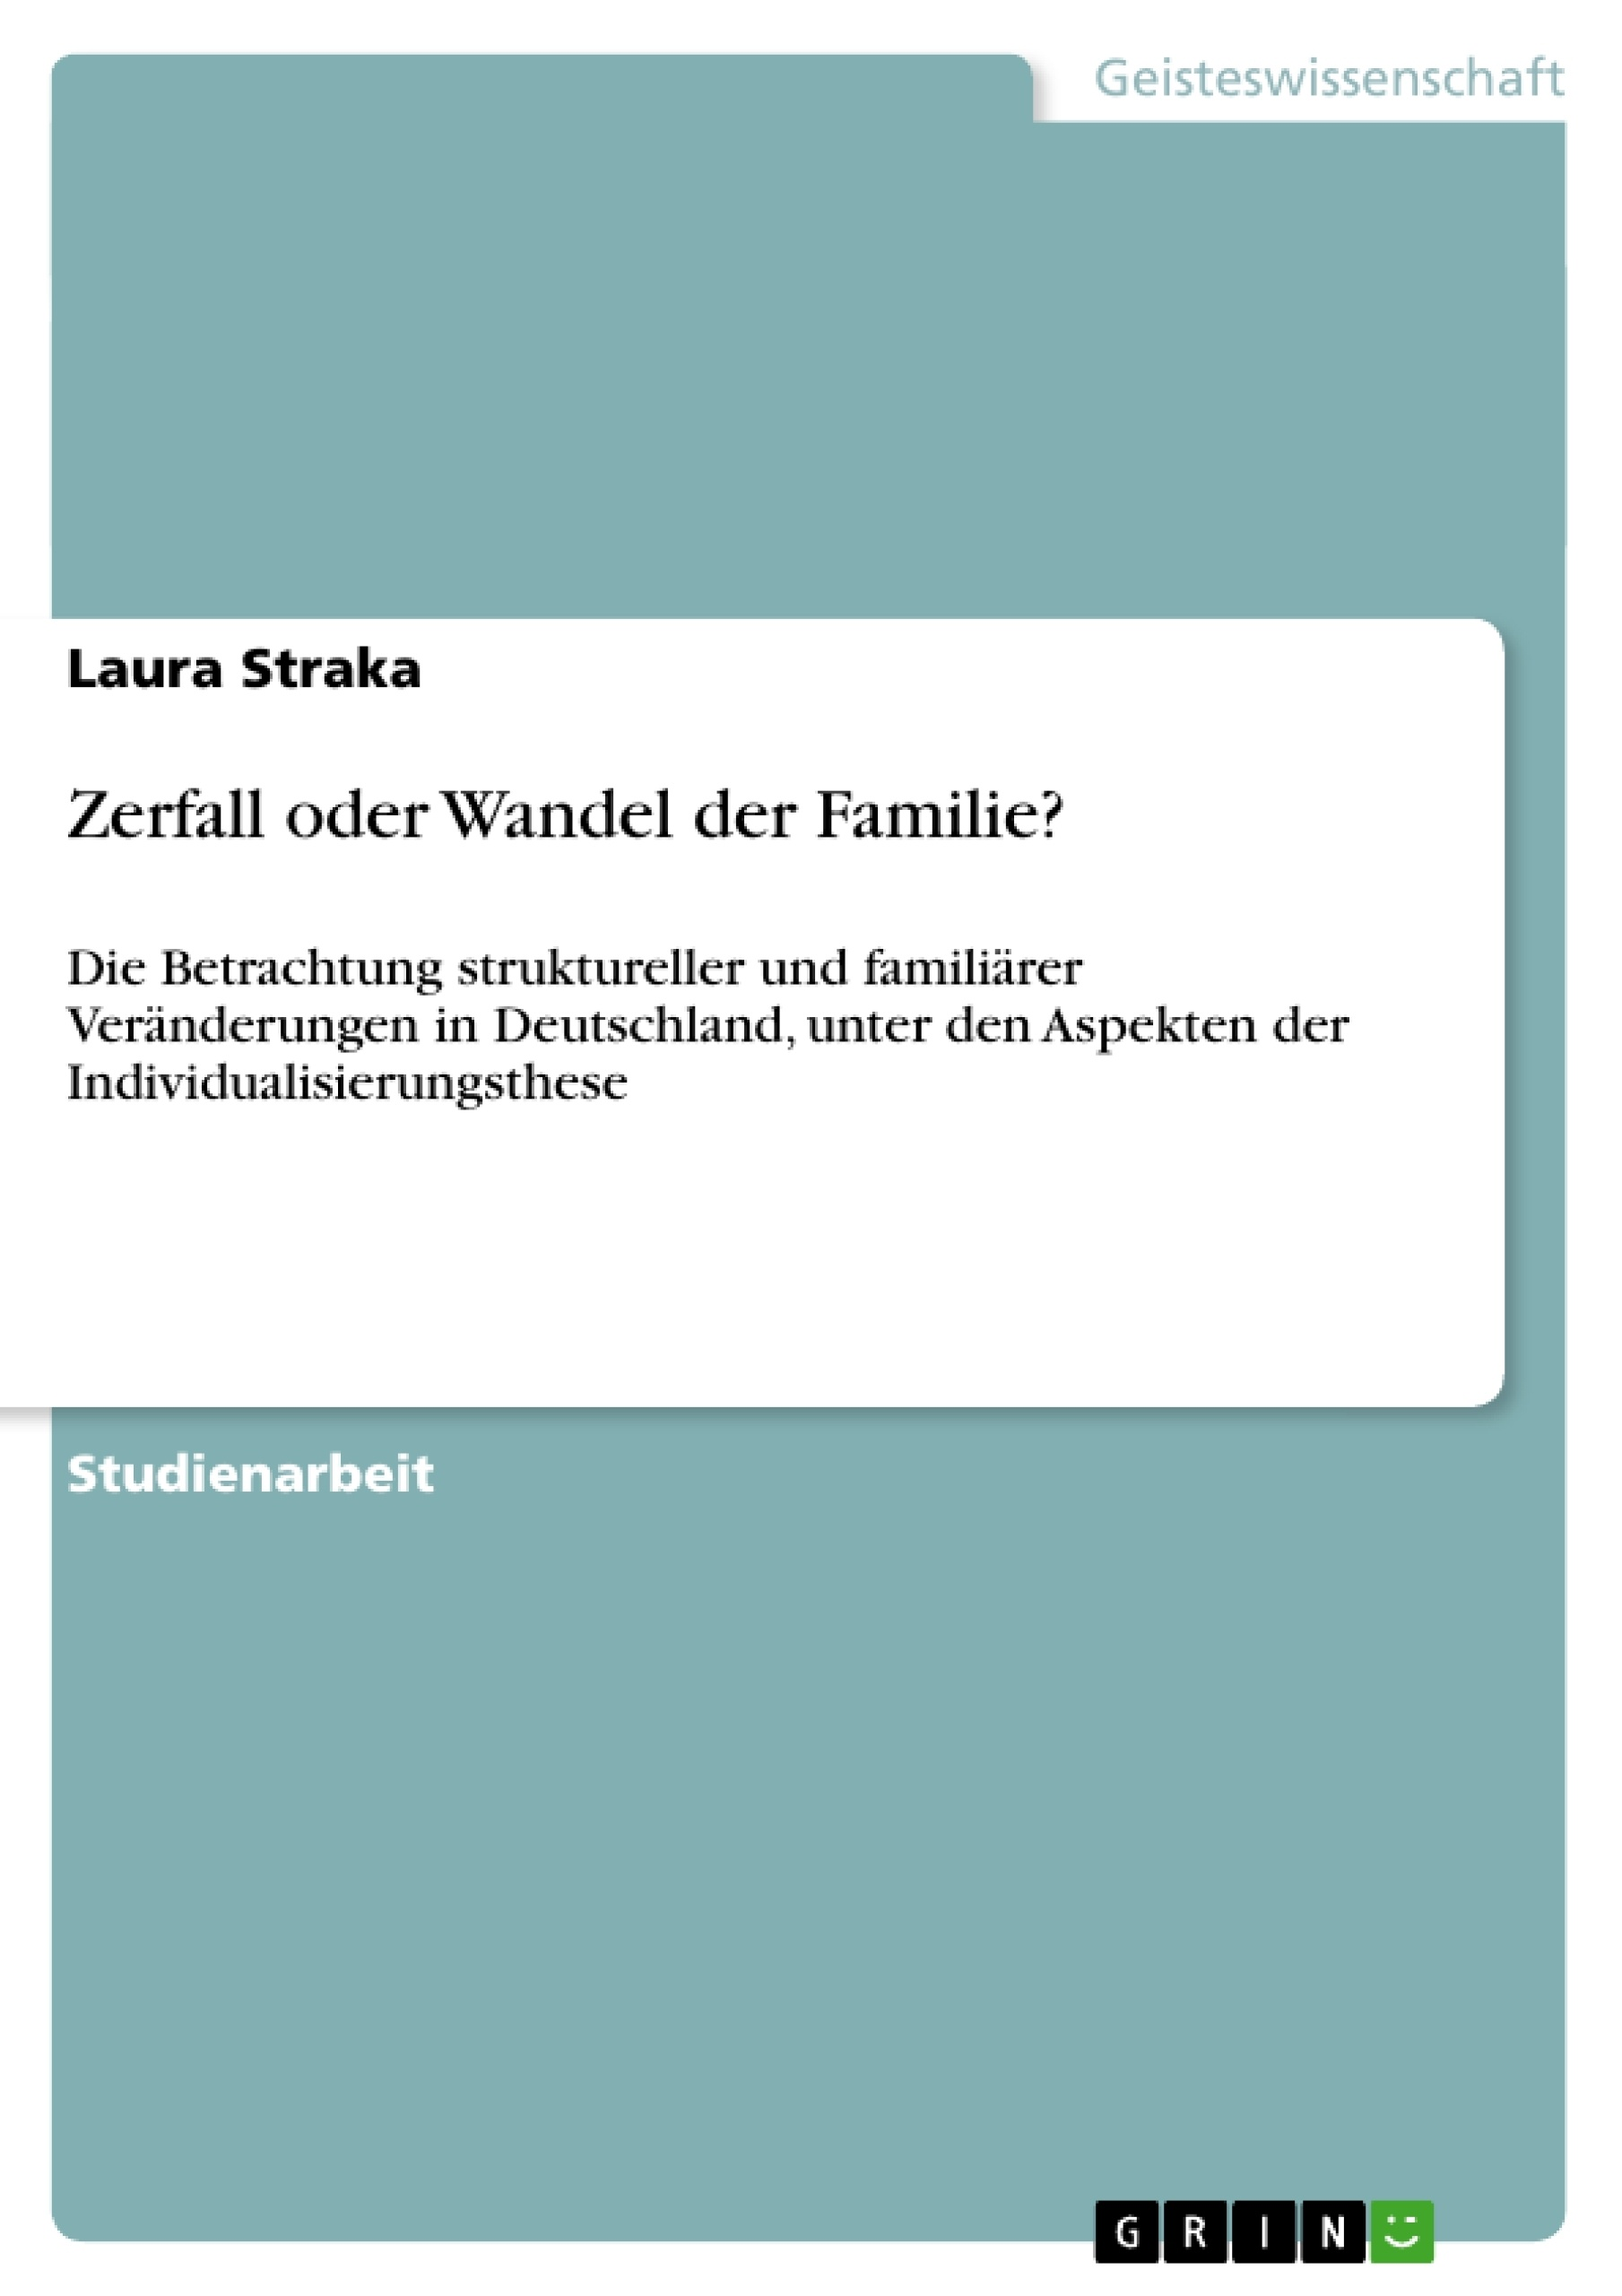 Titel: Zerfall oder Wandel der Familie?